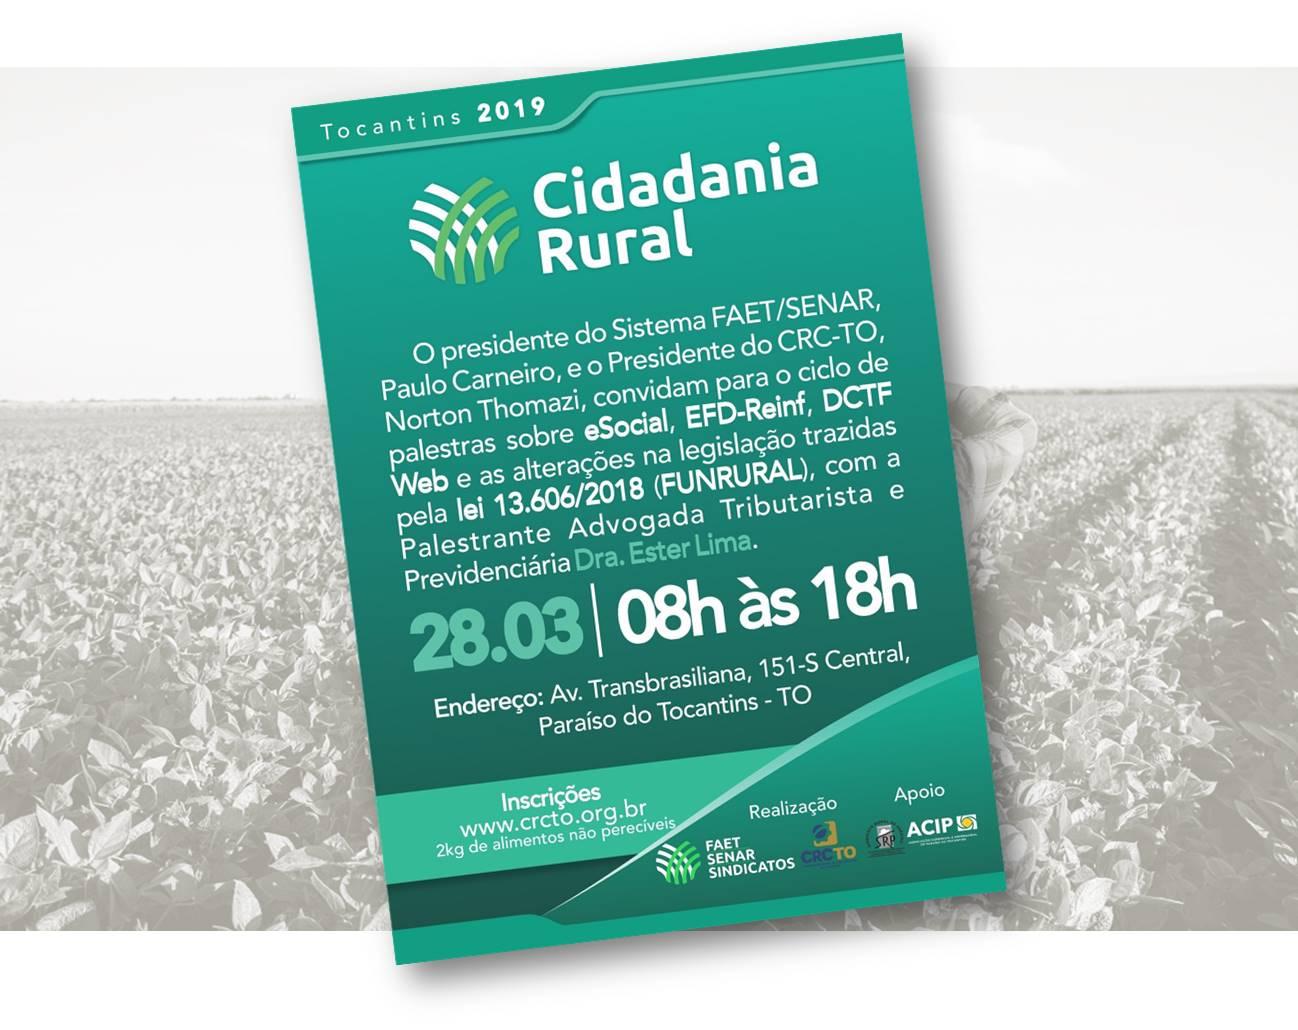 Cidadania Rural: Ciclo de palestras para contadores acontece na próxima quinta, 28, em Paraíso